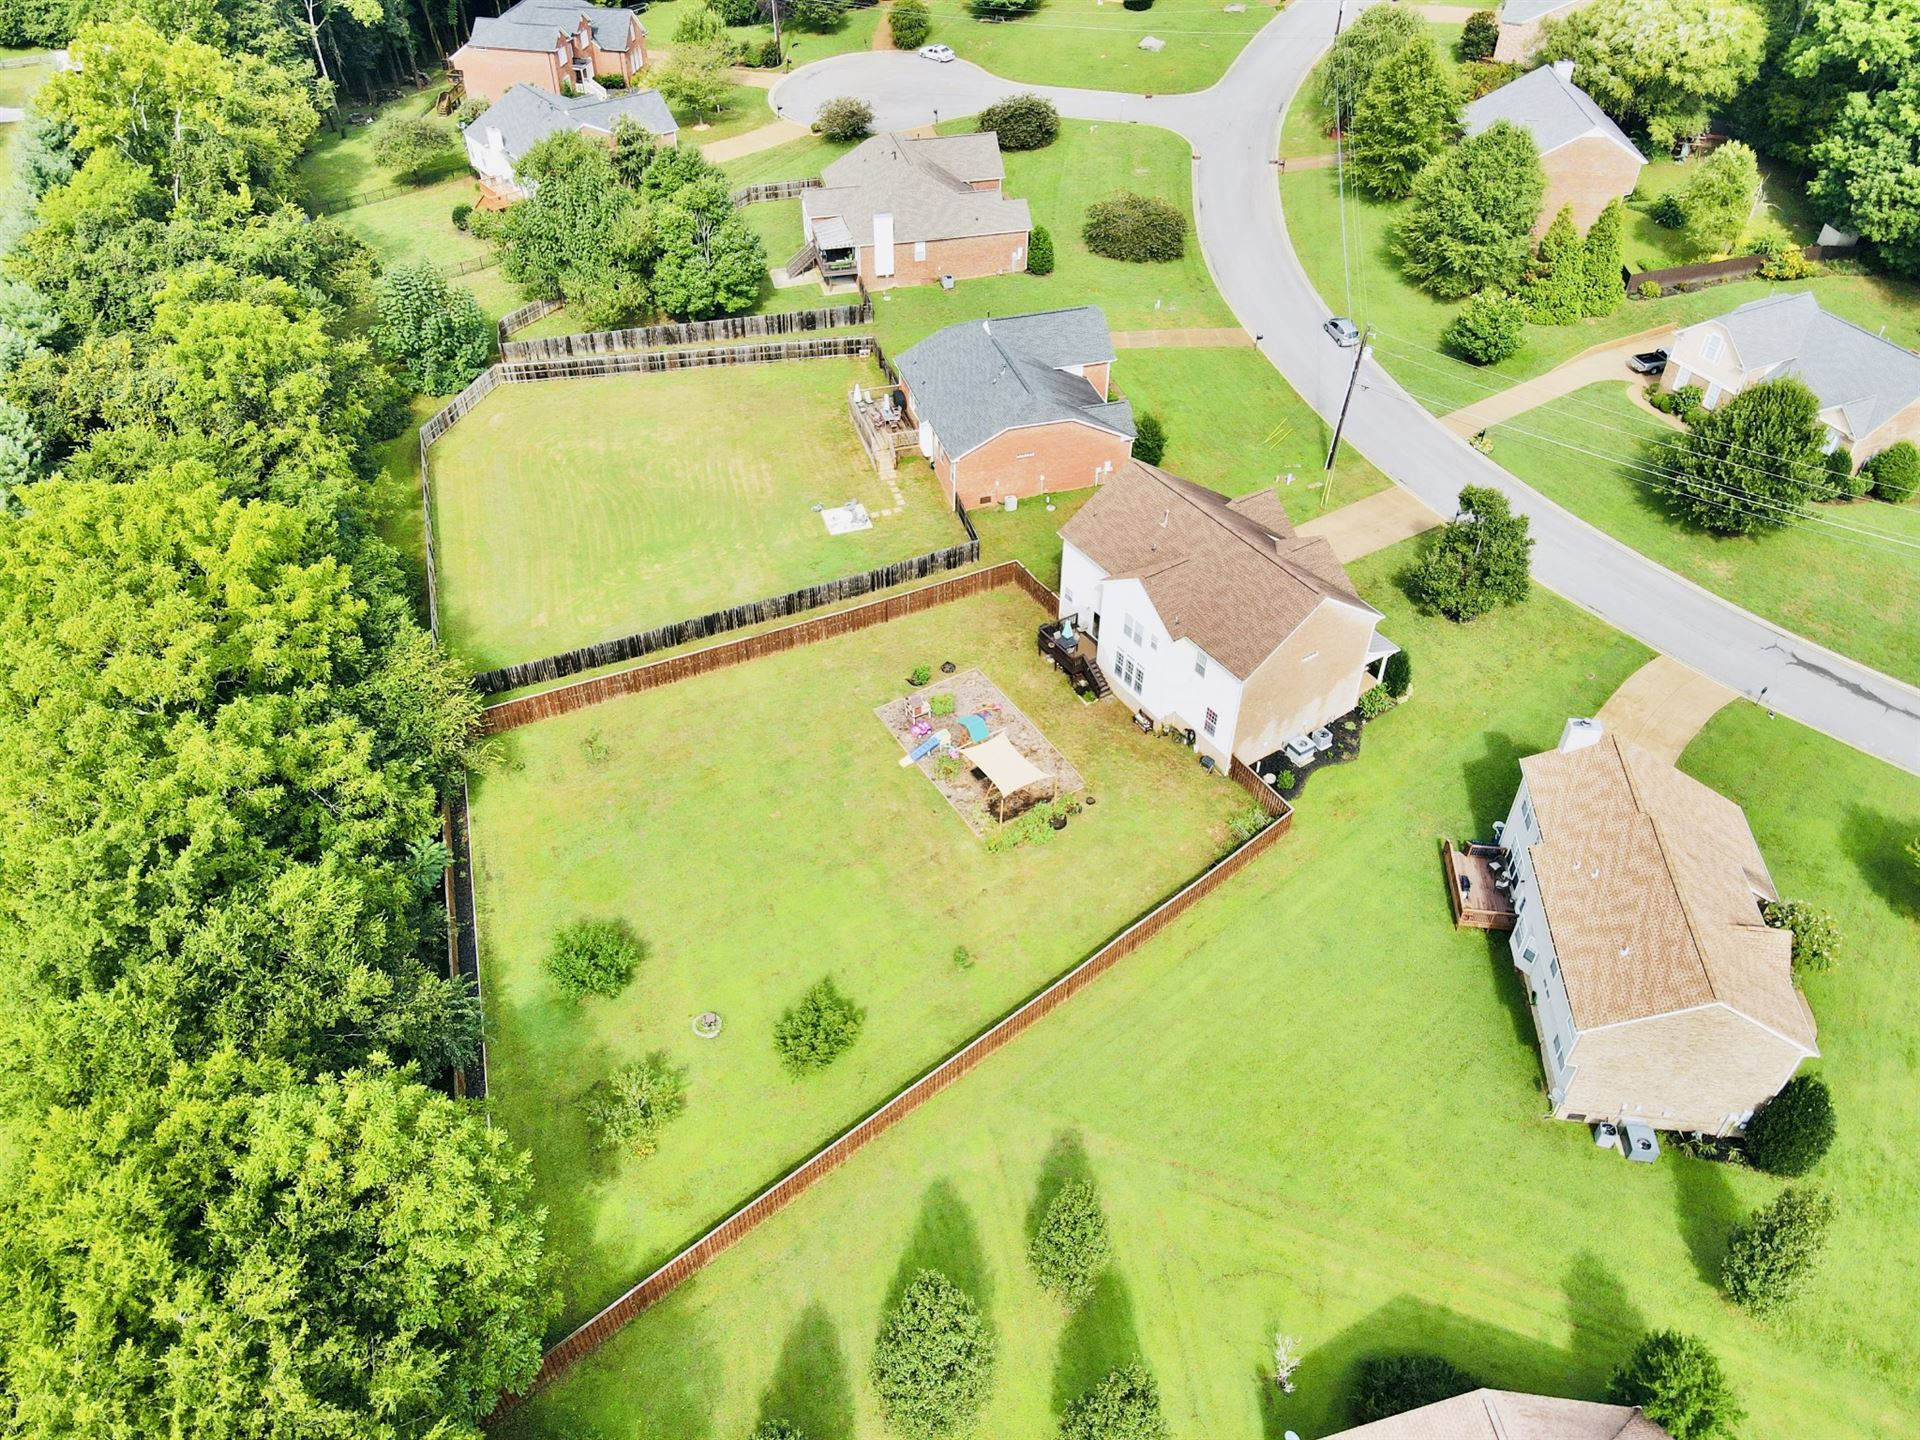 Photo of 1655 Allendale Dr, Nolensville, TN 37135 (MLS # 2287861)